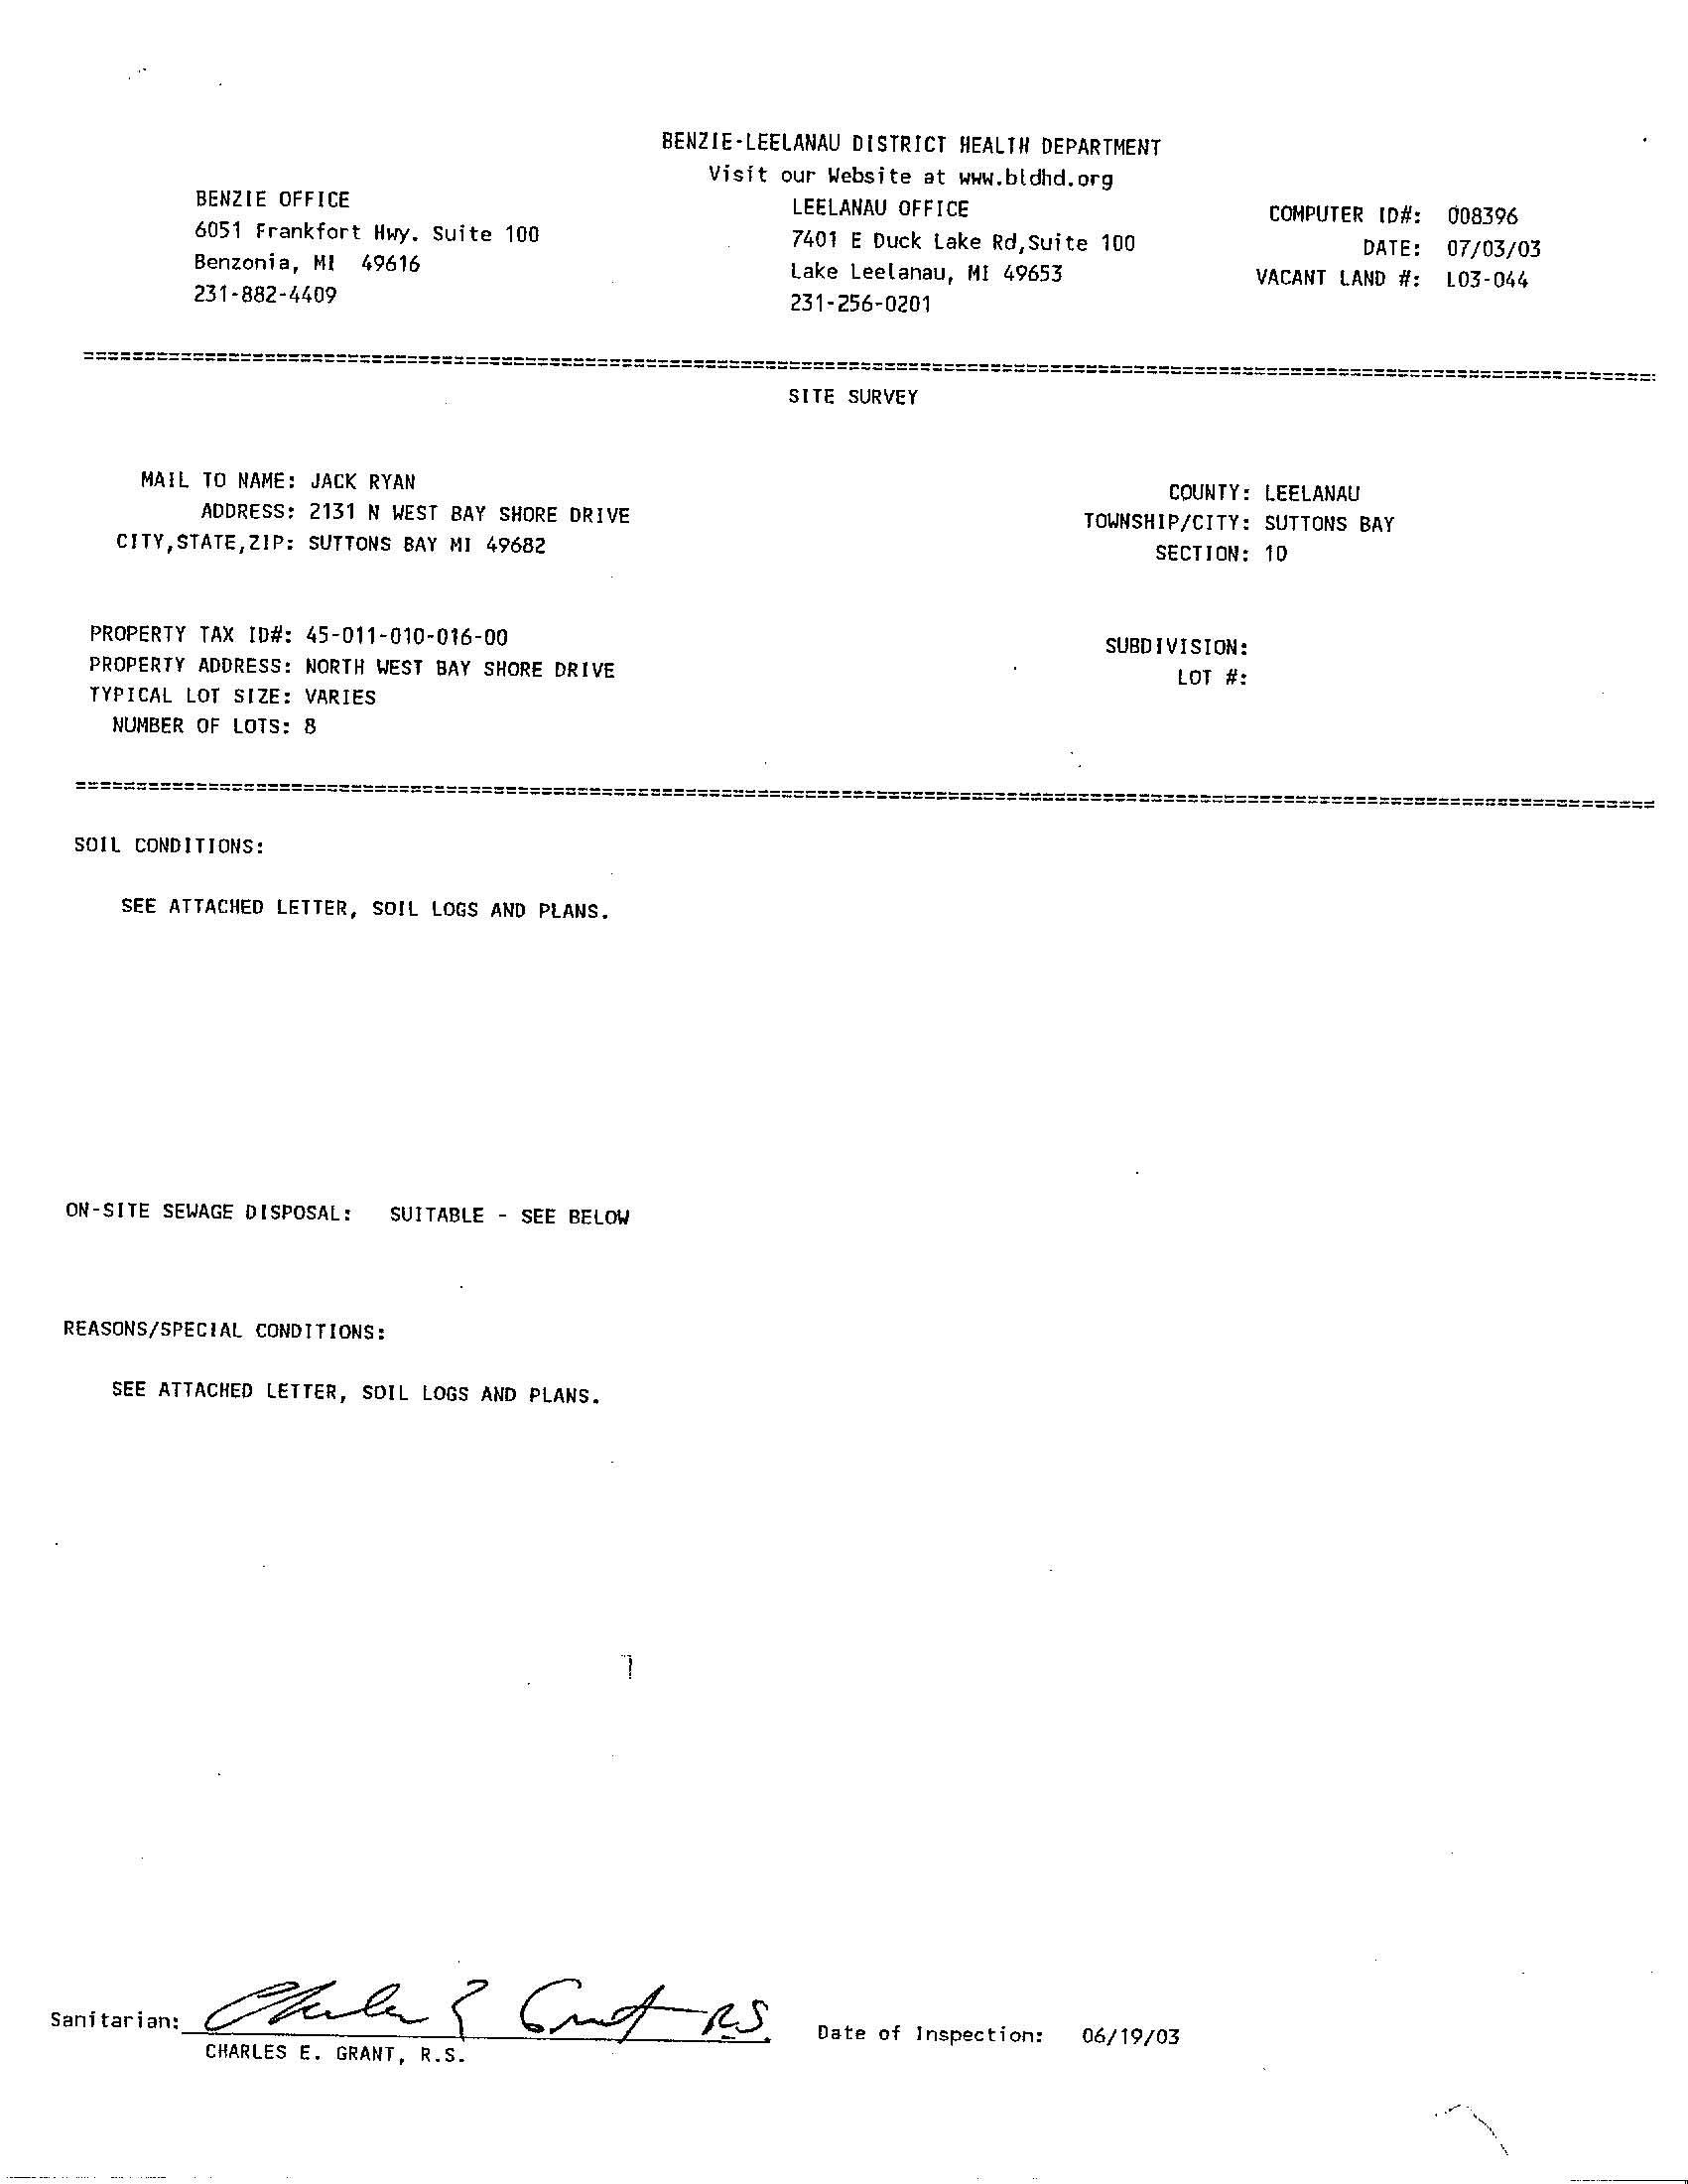 11635 E Belanger Woods Dr Marketing Packet - For Sale by Oltersdorf Realty LLC (15).jpg